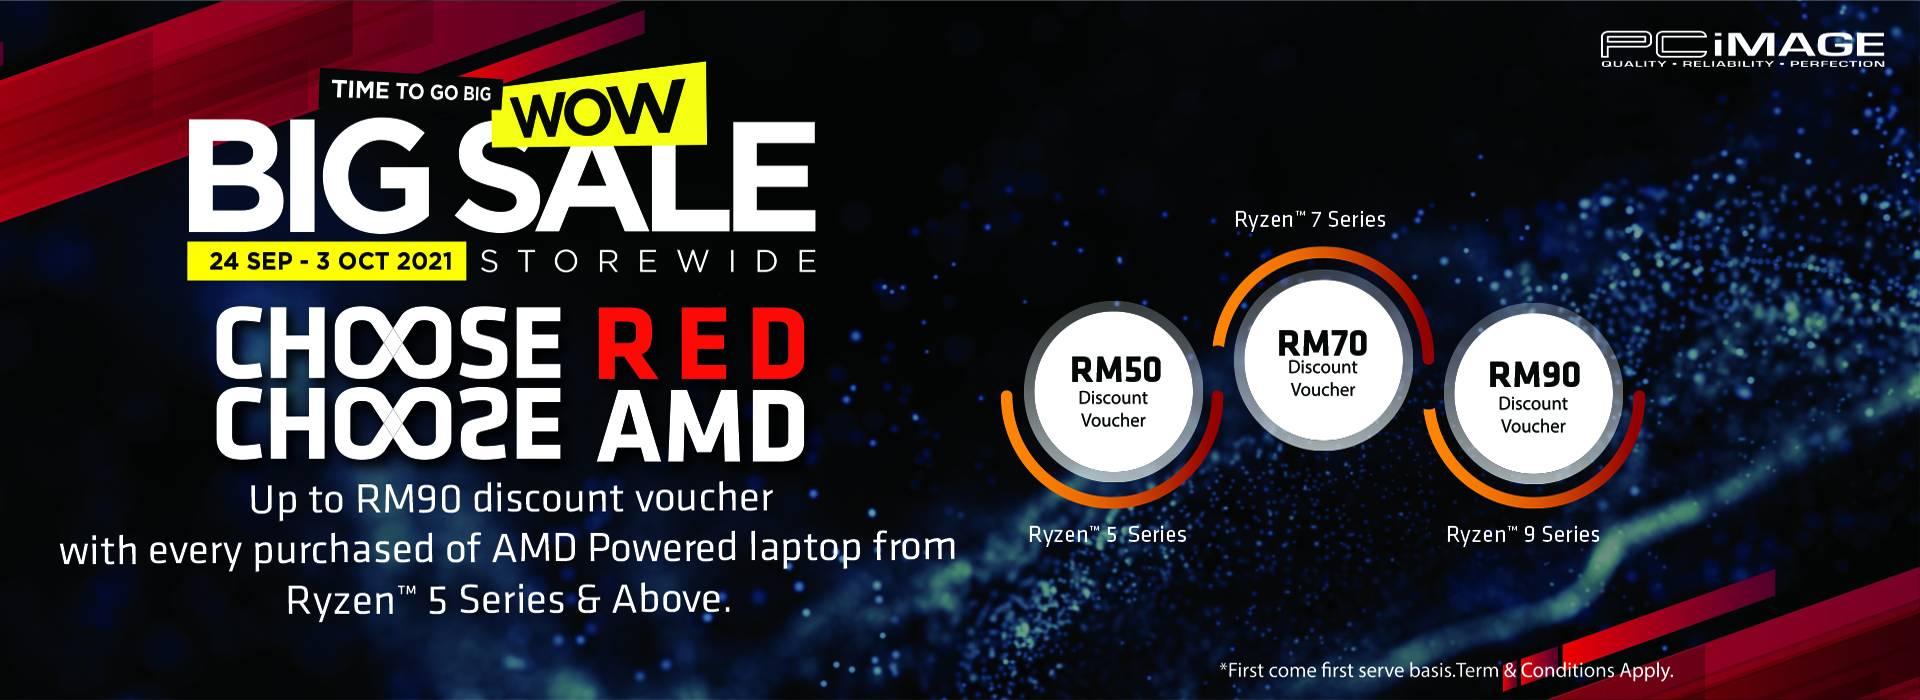 WBS AMD 3 OCT